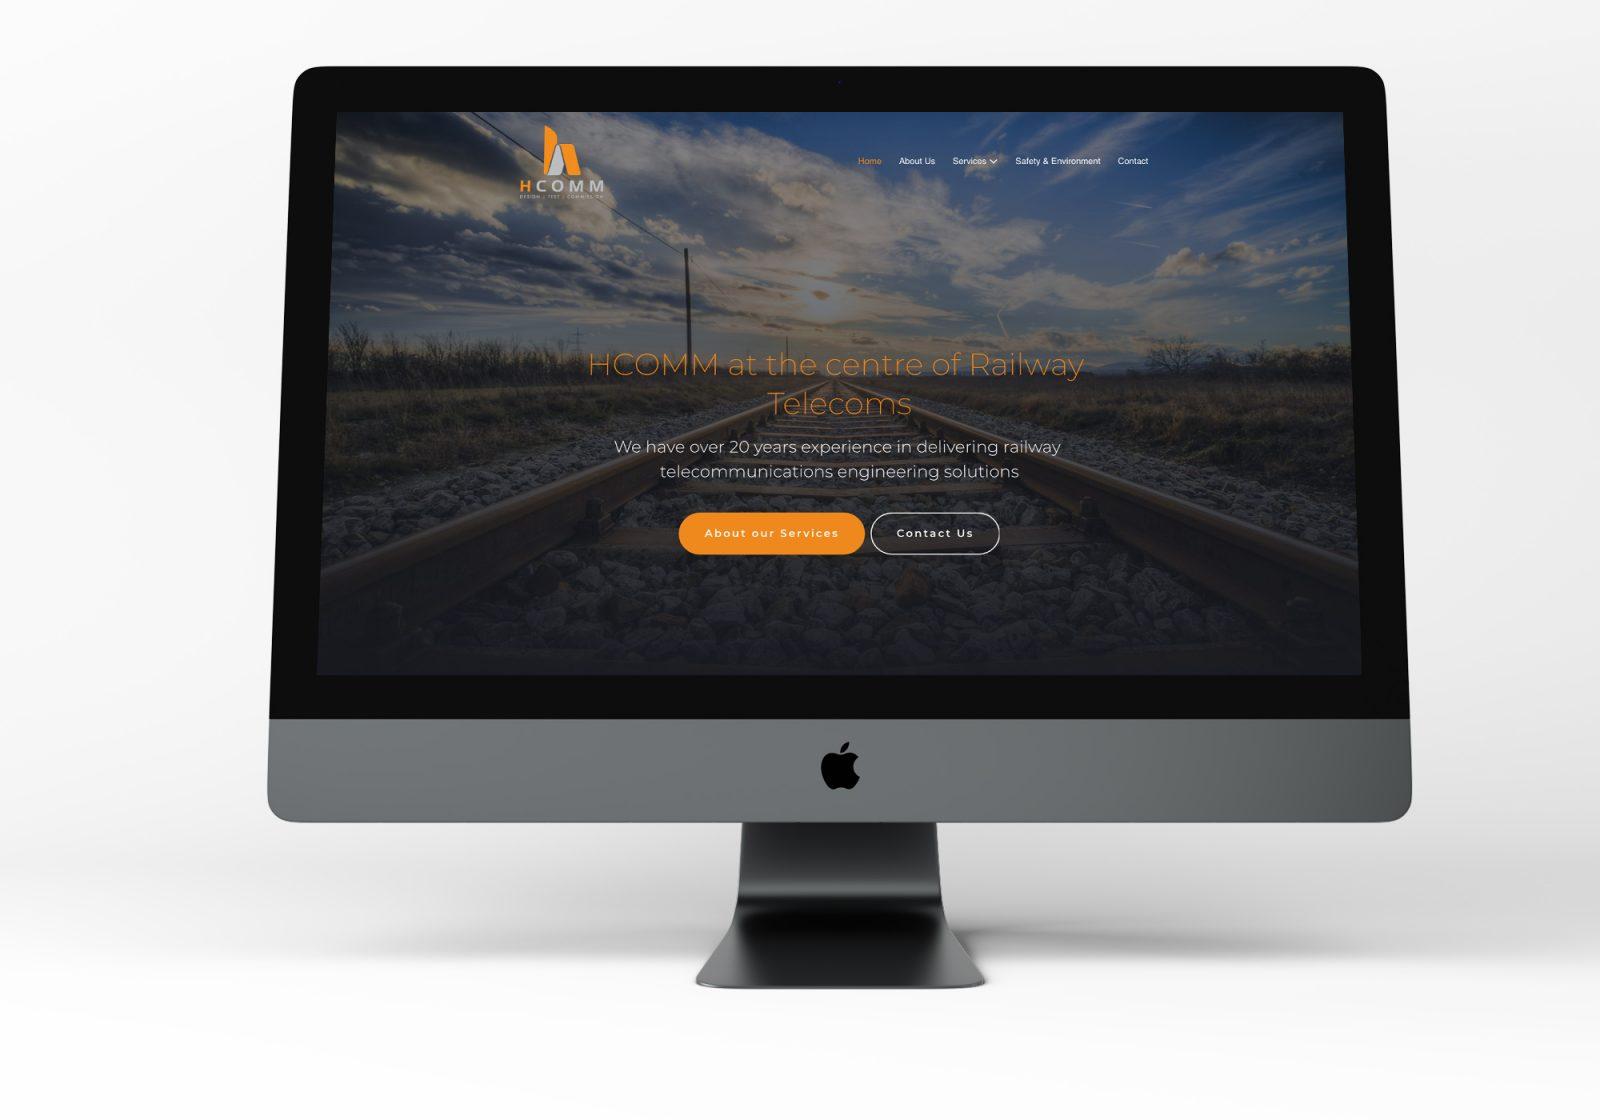 Hcomm's new website on a iMac